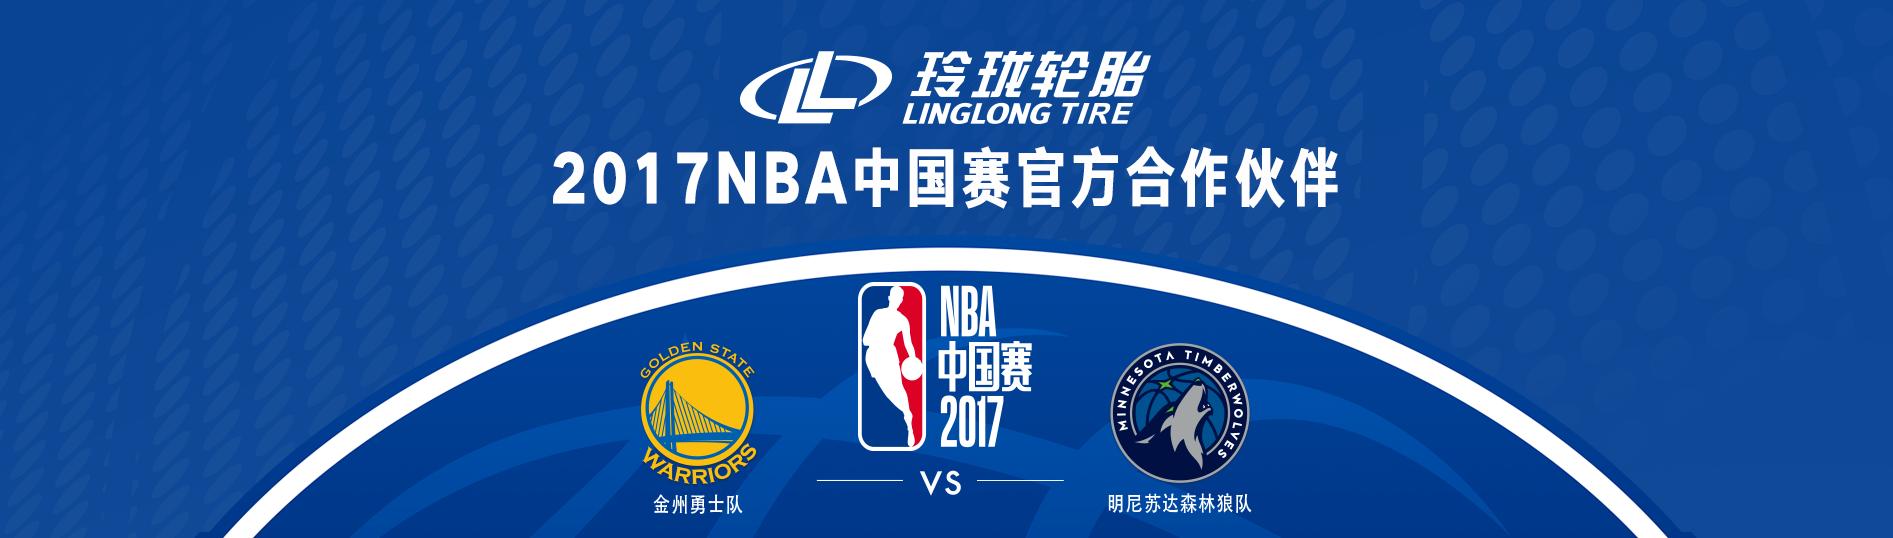 NBA中国赛官方合作伙伴